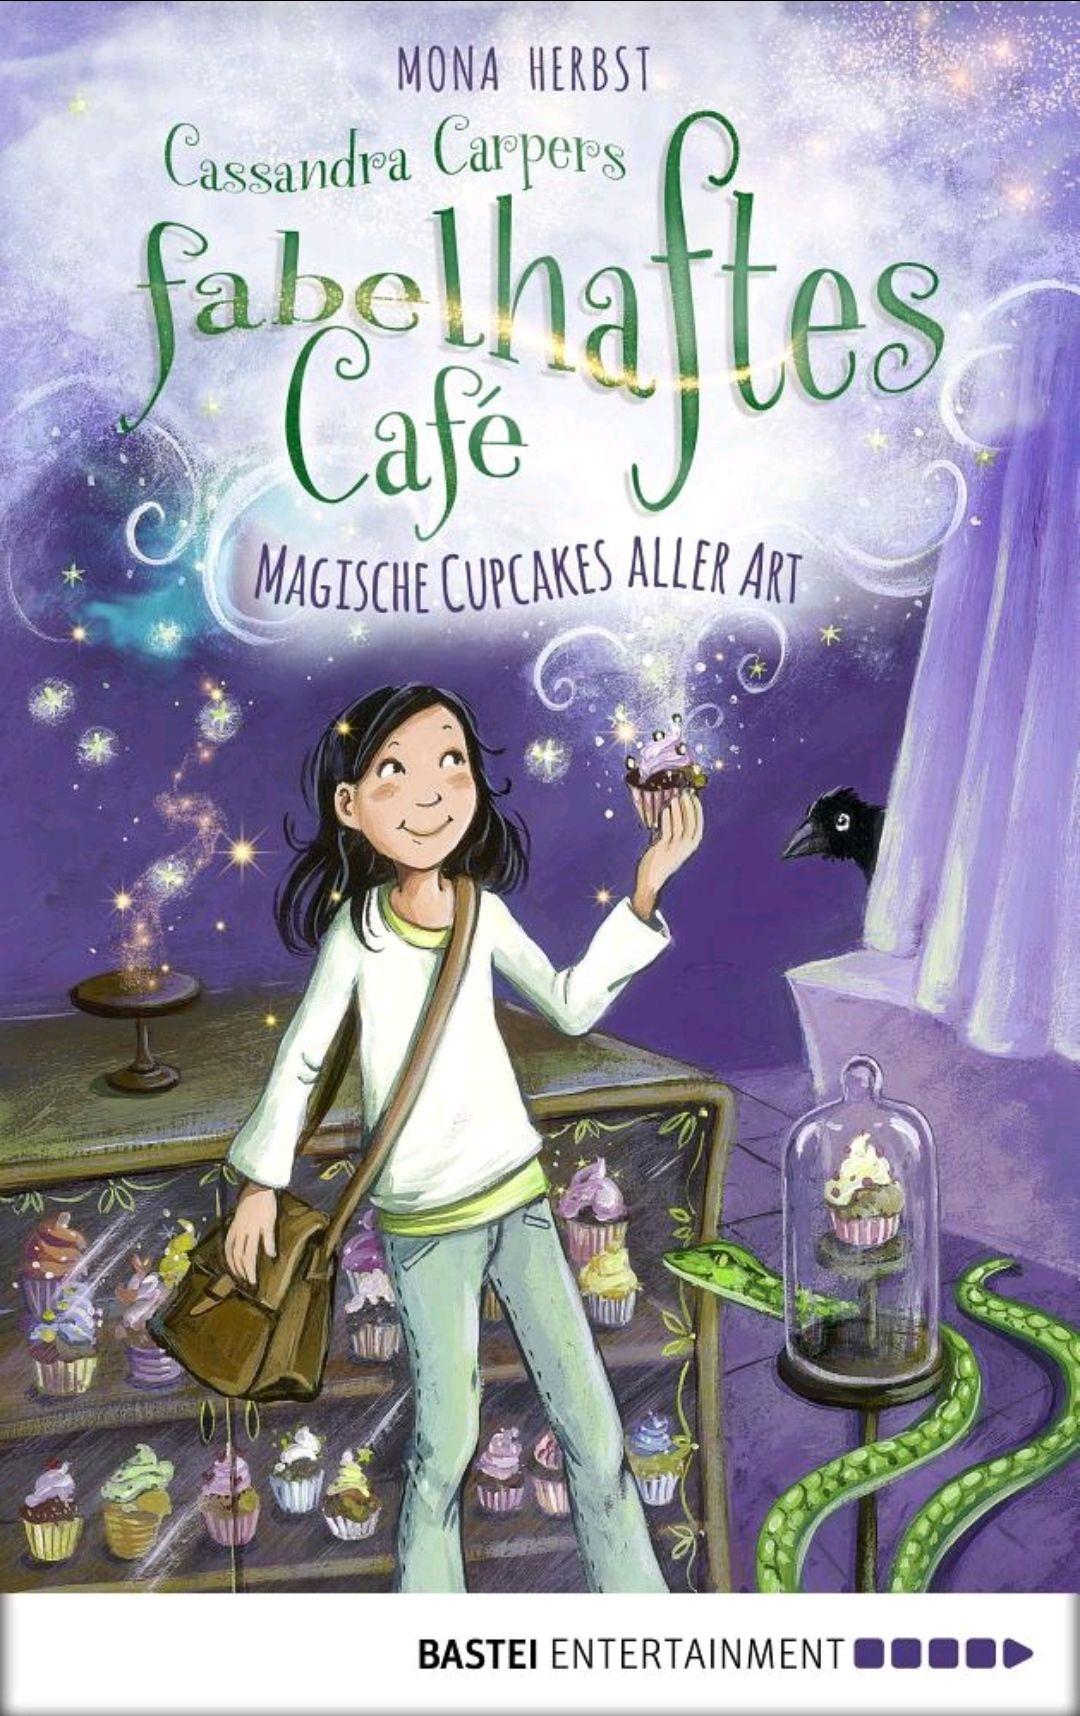 Cassandra Carpers fabelhaftes Café: Magische Cupcakes aller Art kostenloses eBook (PlayStore & Amazon)